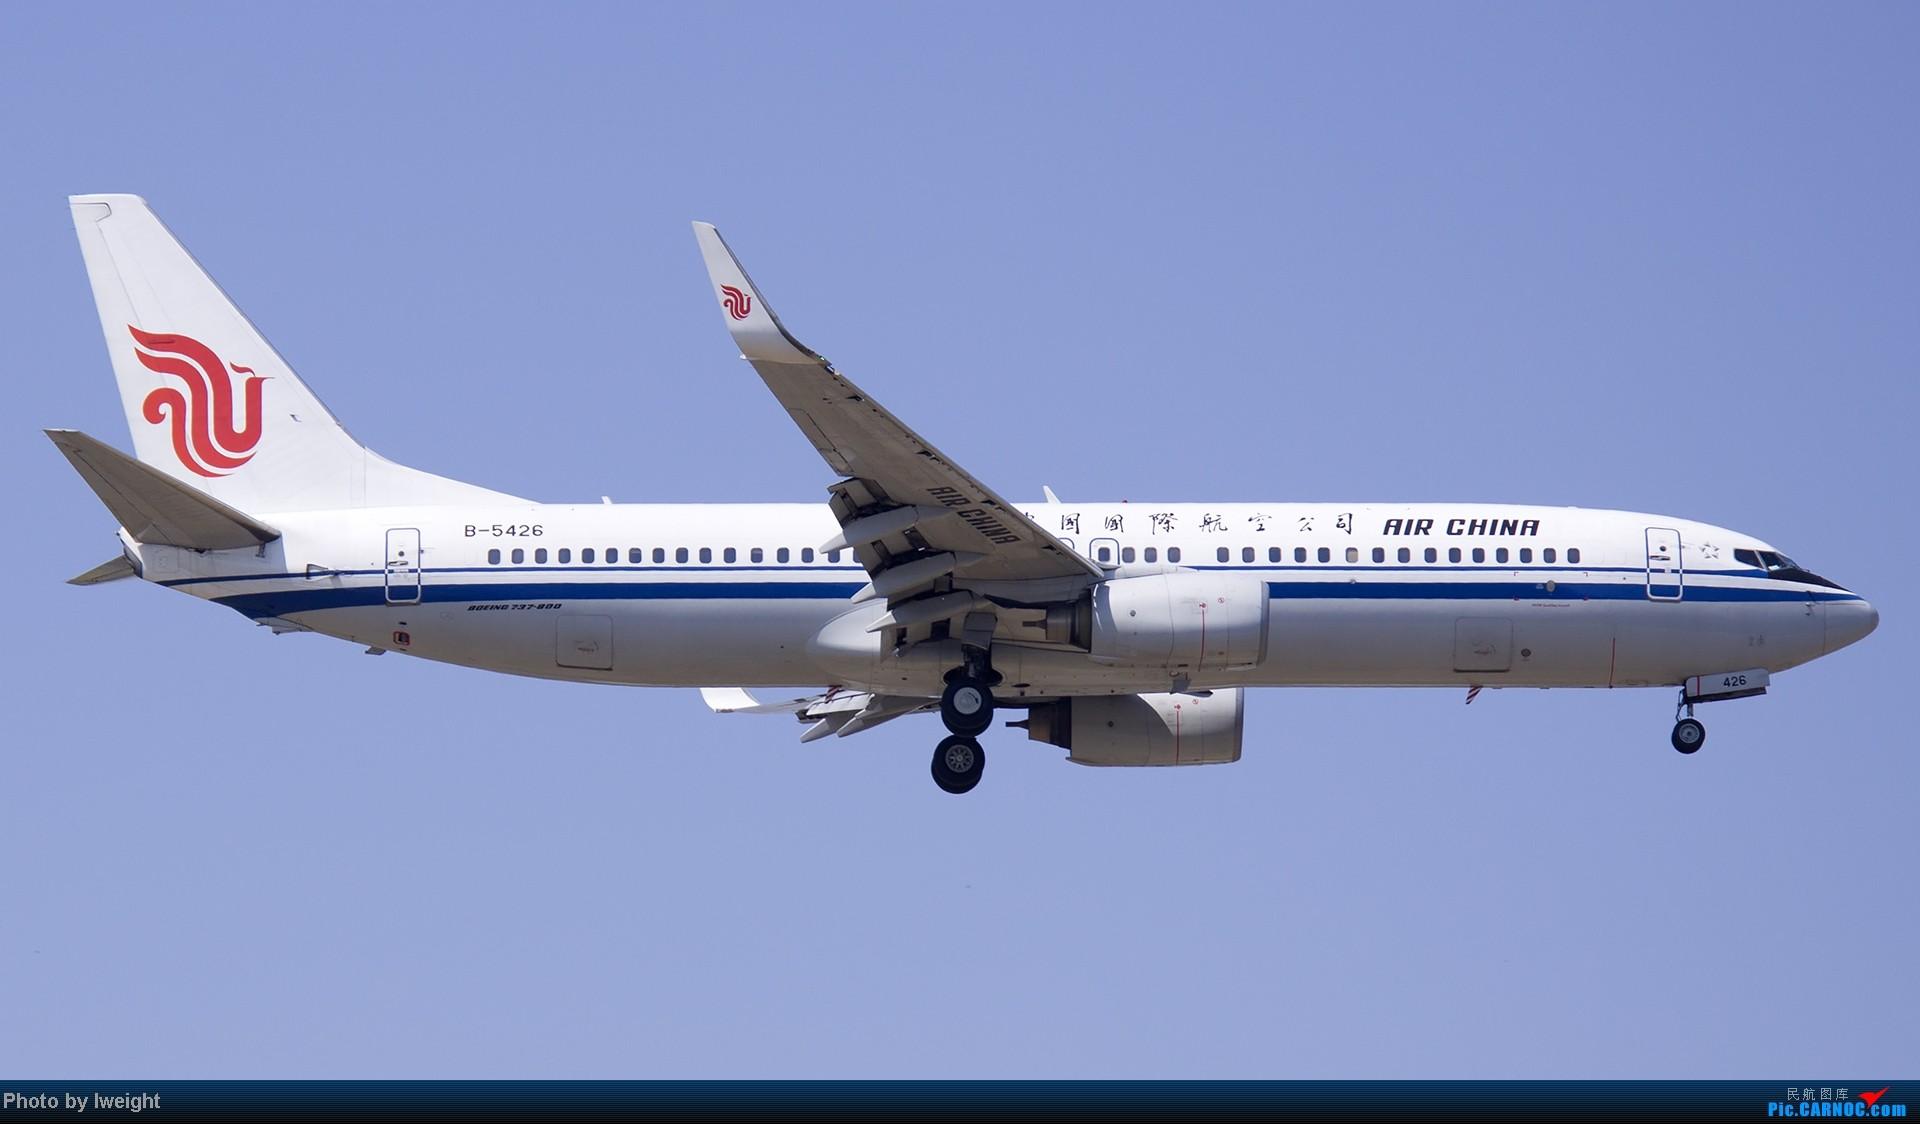 Re:[原创]北京难得的好天气,收获多种机型和彩绘,遗憾的是再次错过卡航巴塞罗那彩绘 BOEING 737-800 B-5426 中国北京首都机场